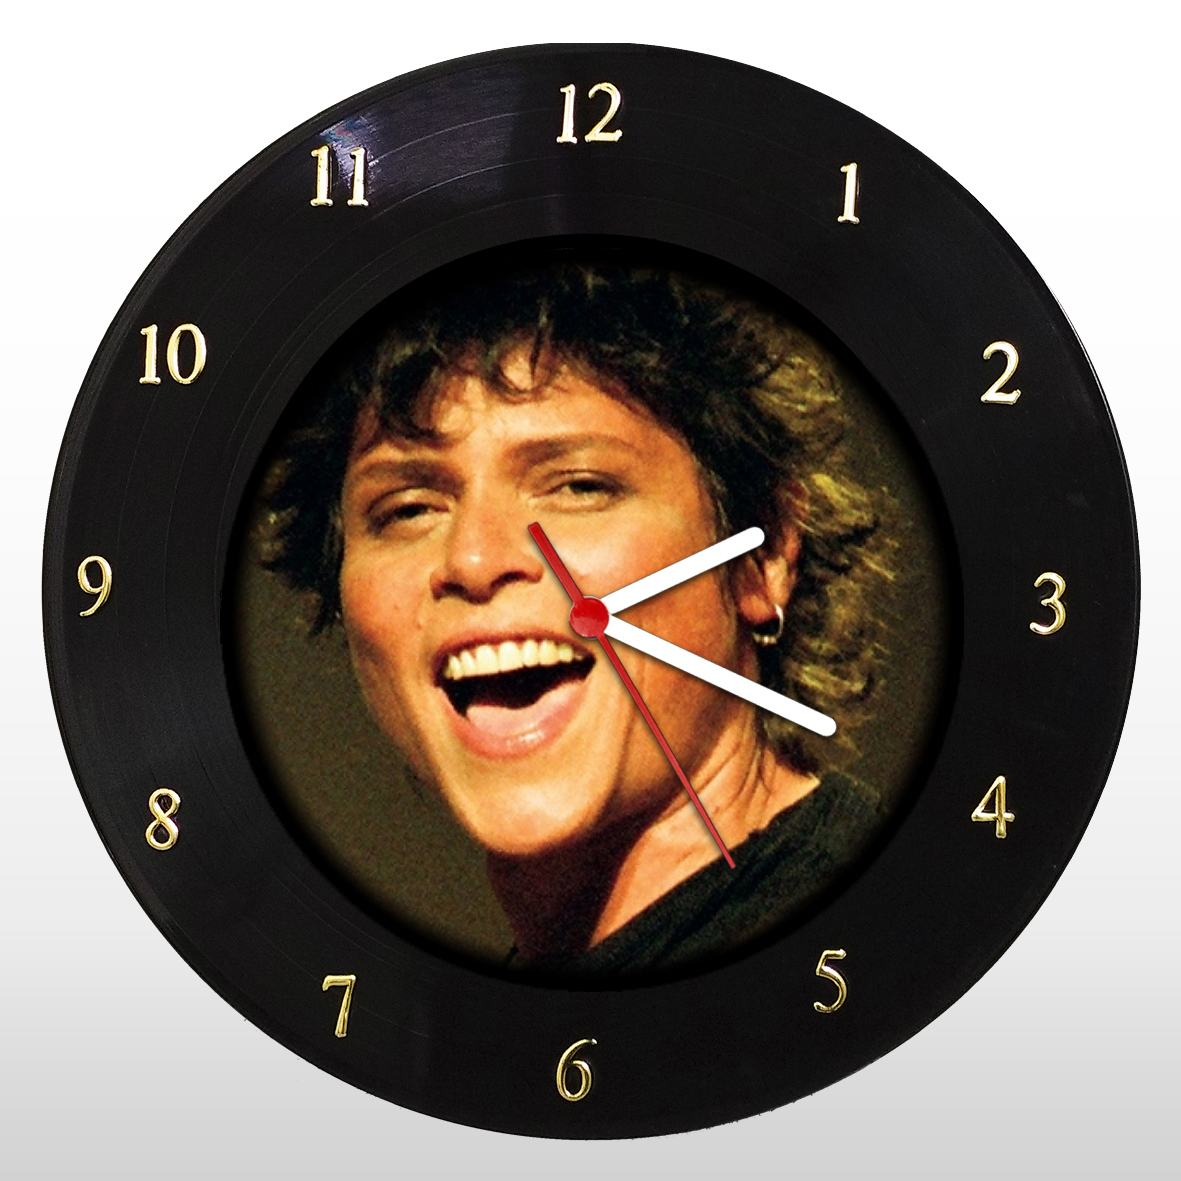 Relógio de Parede em Disco de Vinil Mr. Rock Cássia Eller